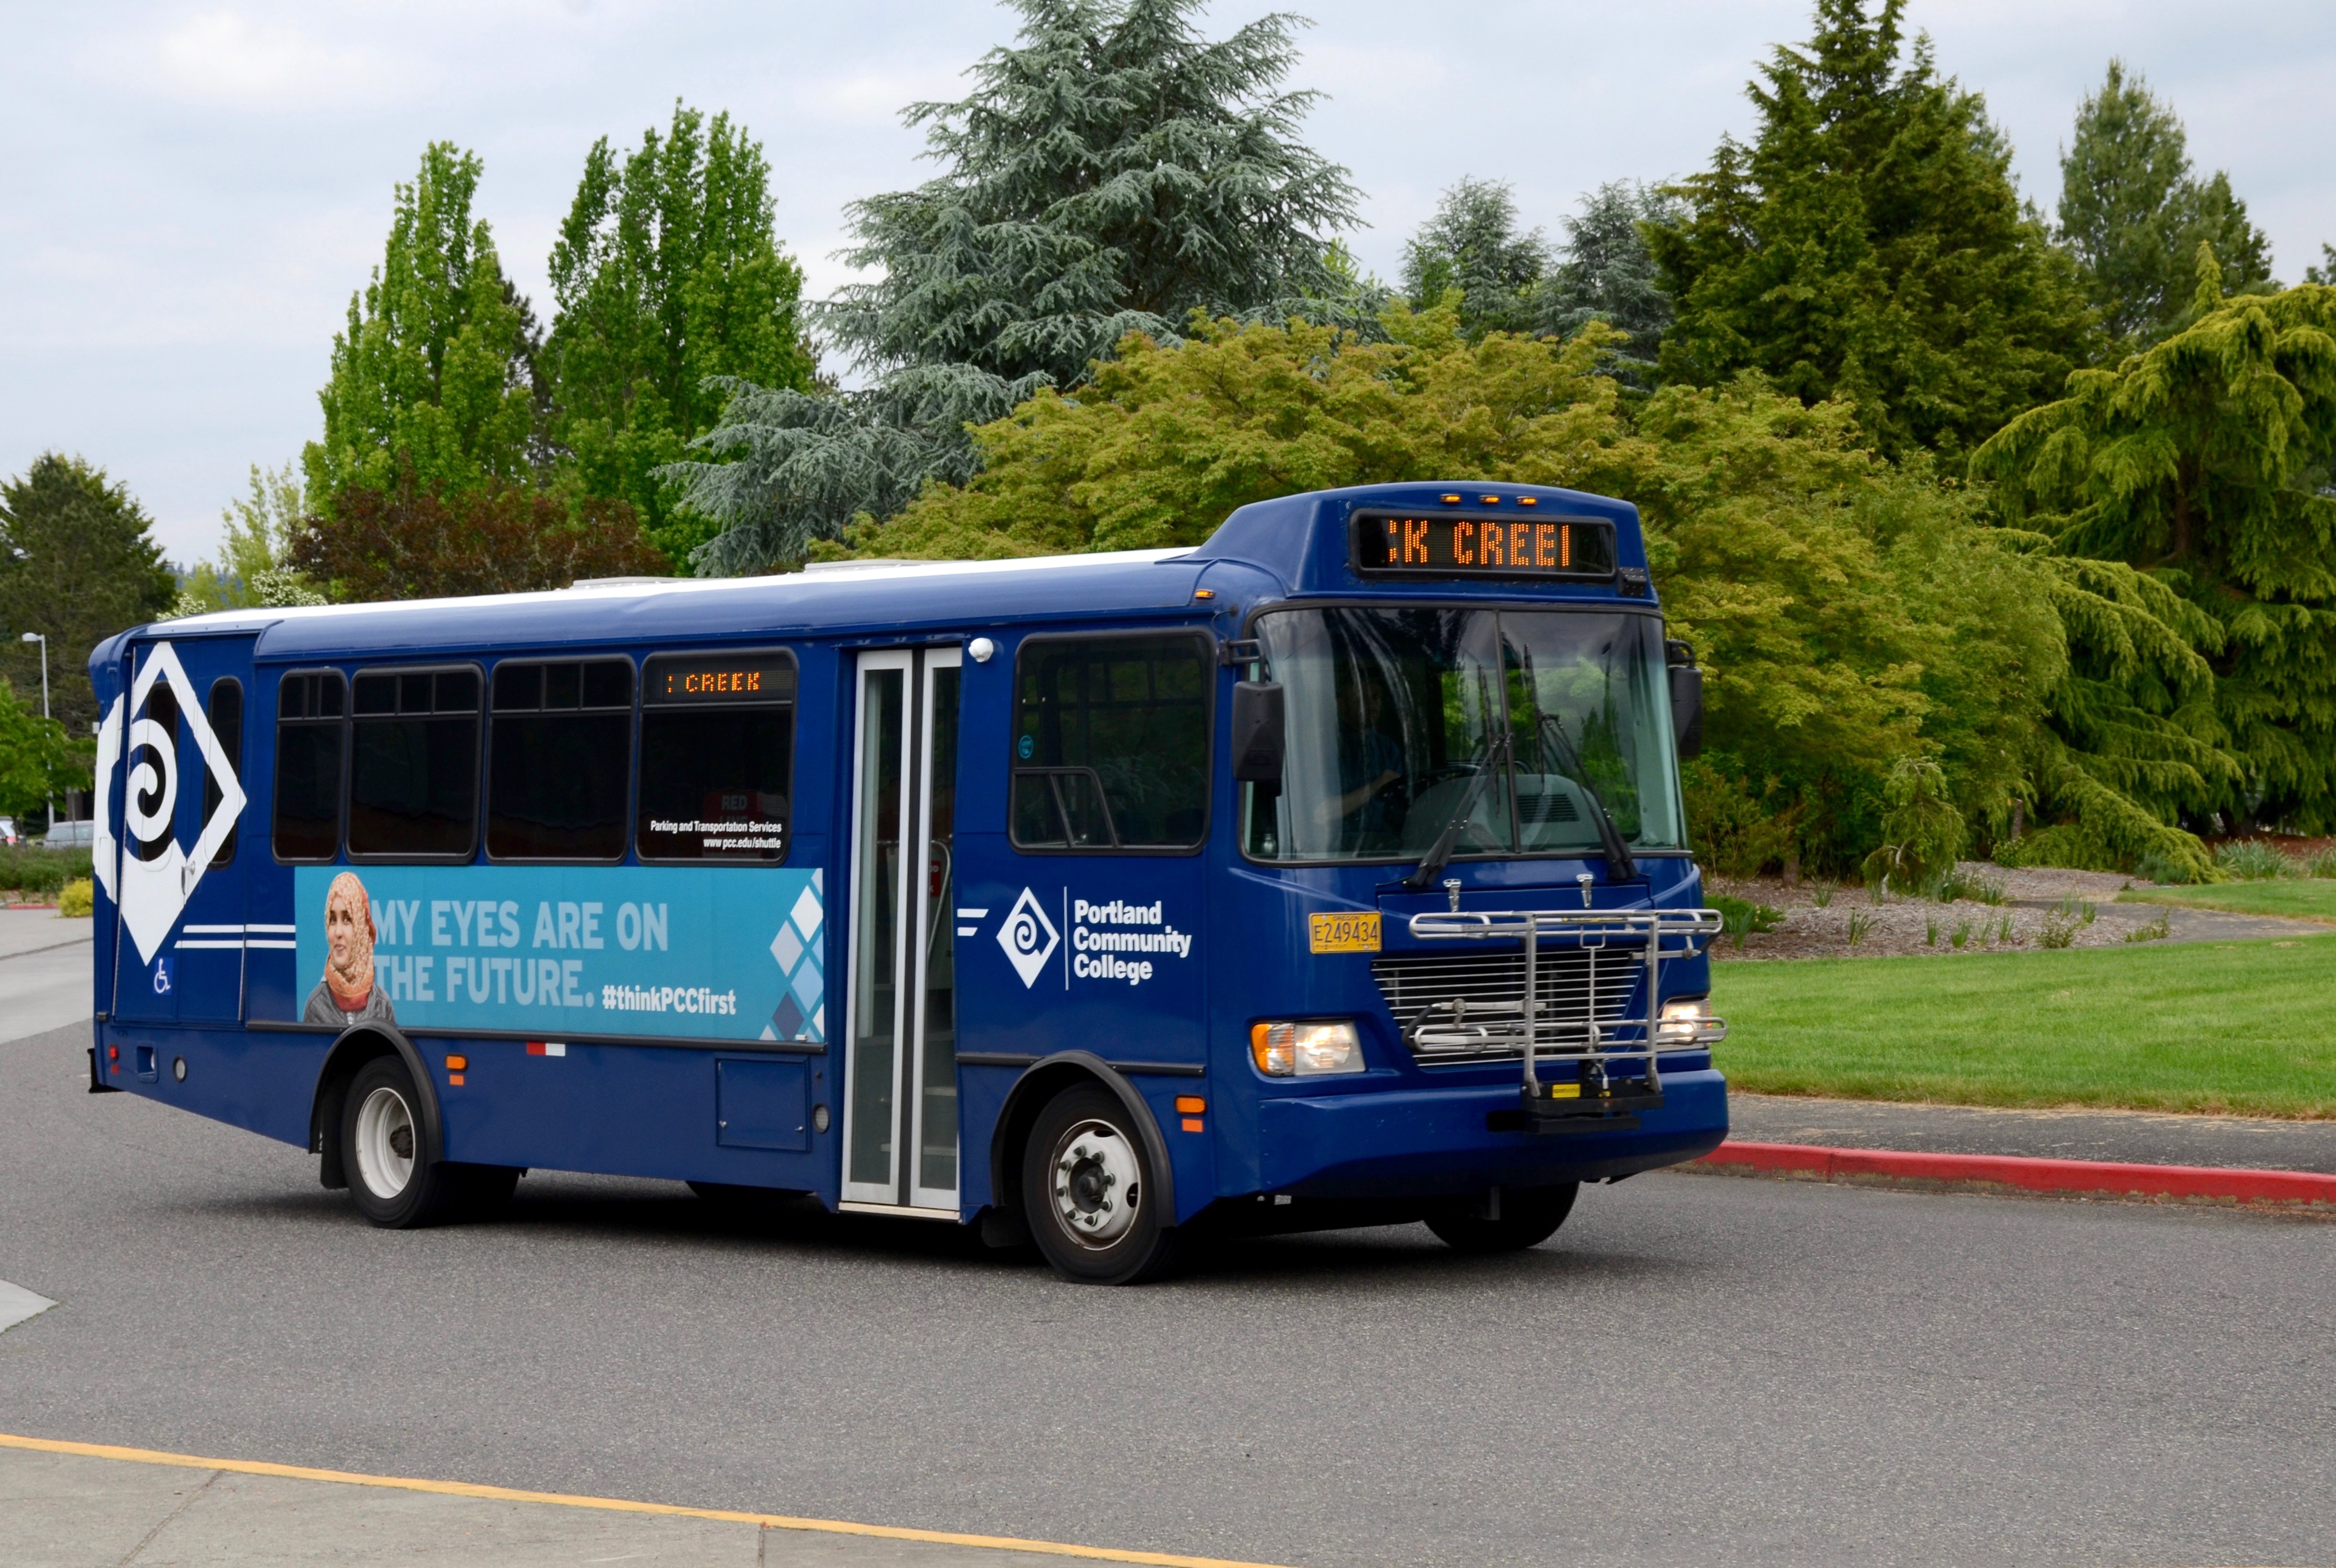 File:PCC shuttle bus on Rock Creek campus (2018).jpg - Wikimedia Commons